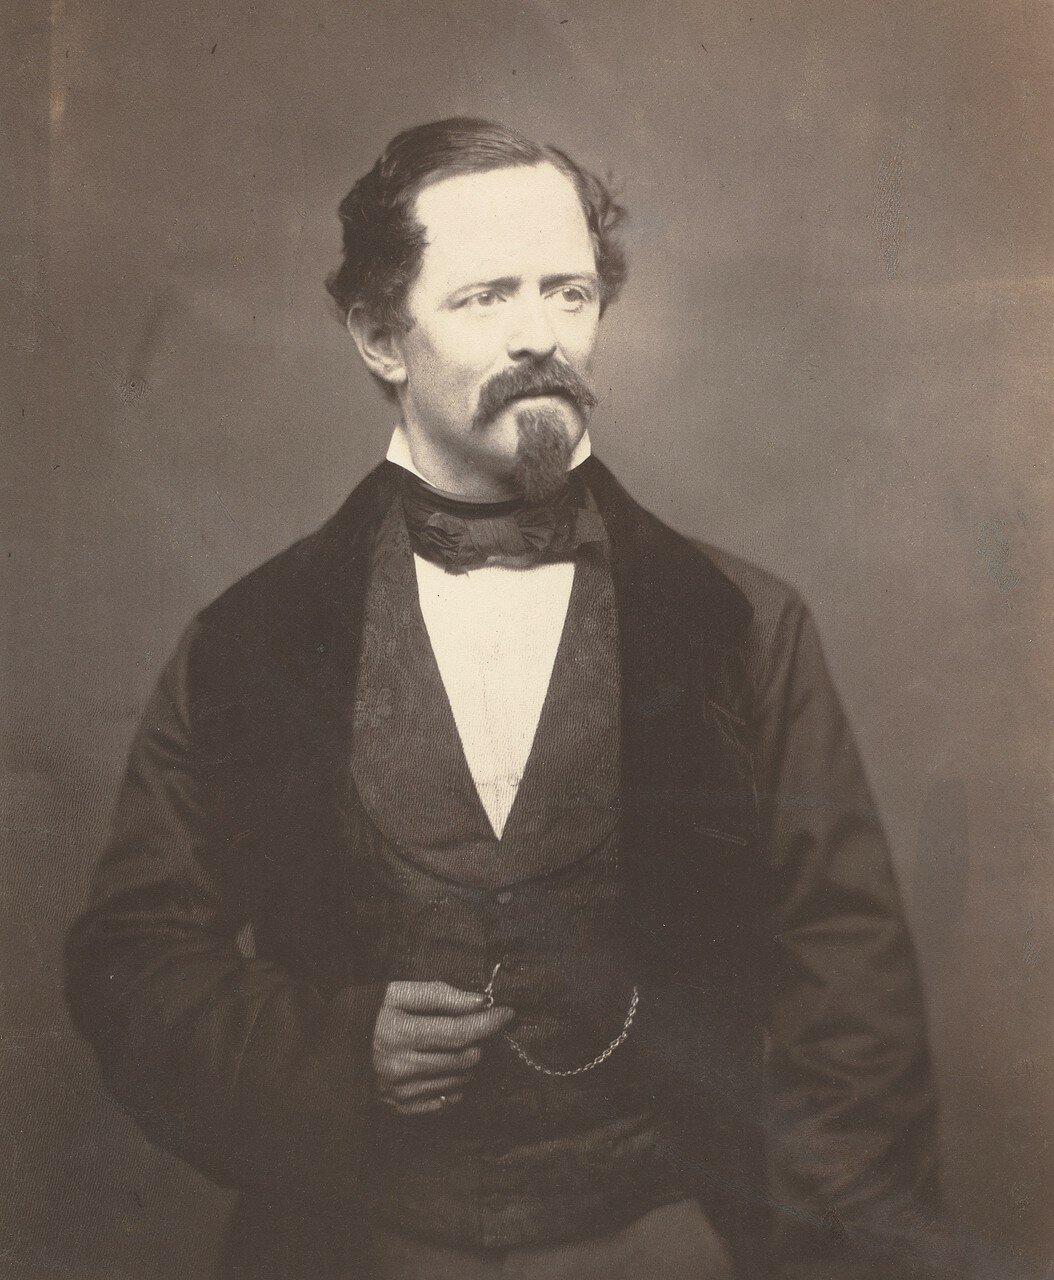 1850. Уильям Генри Пауэлл